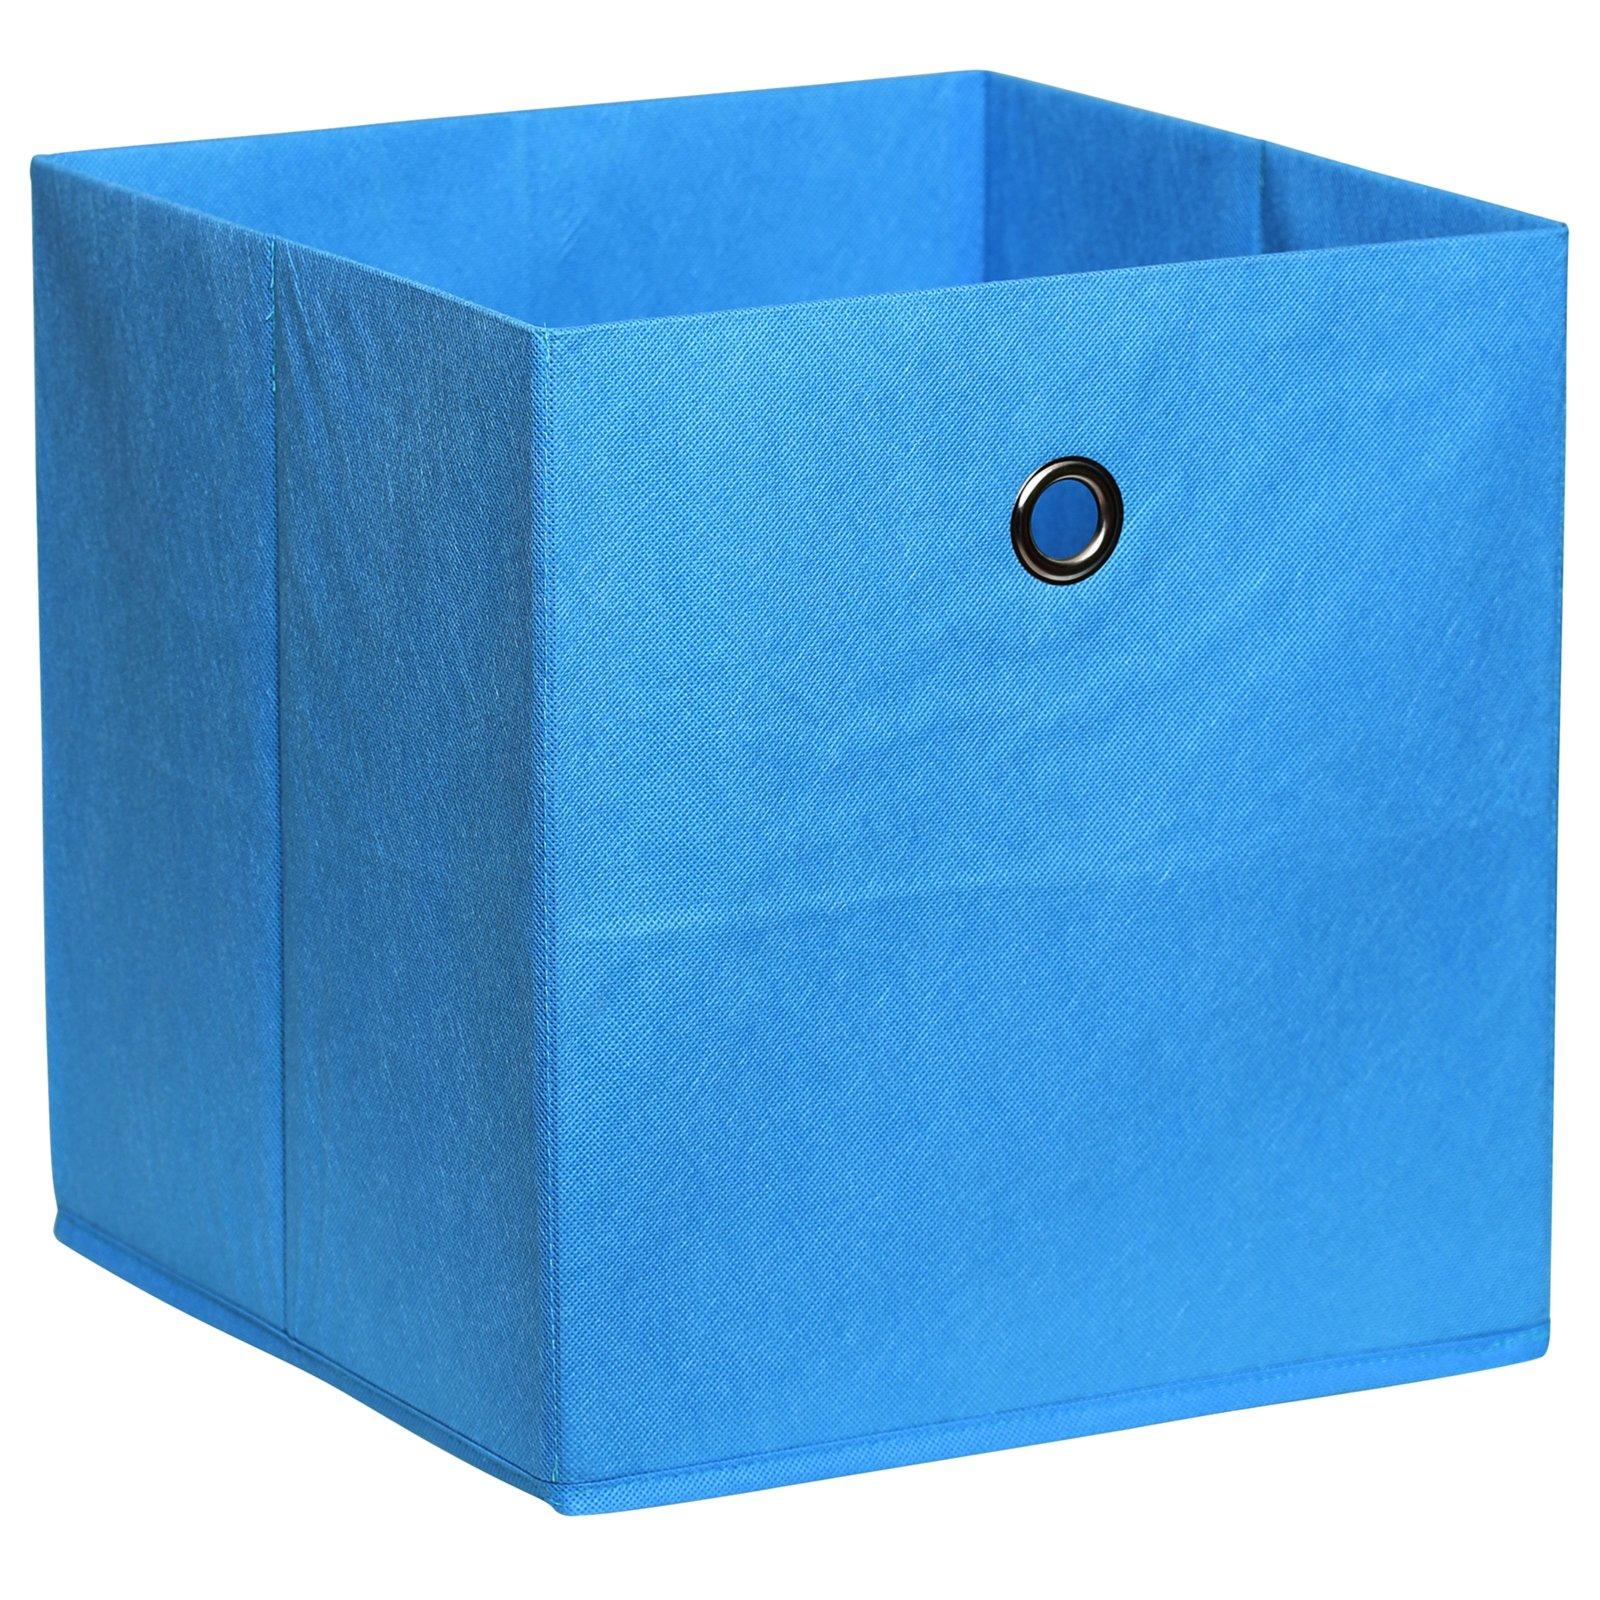 Faltbox - petrol - mit Metallöse - 32x32 cm